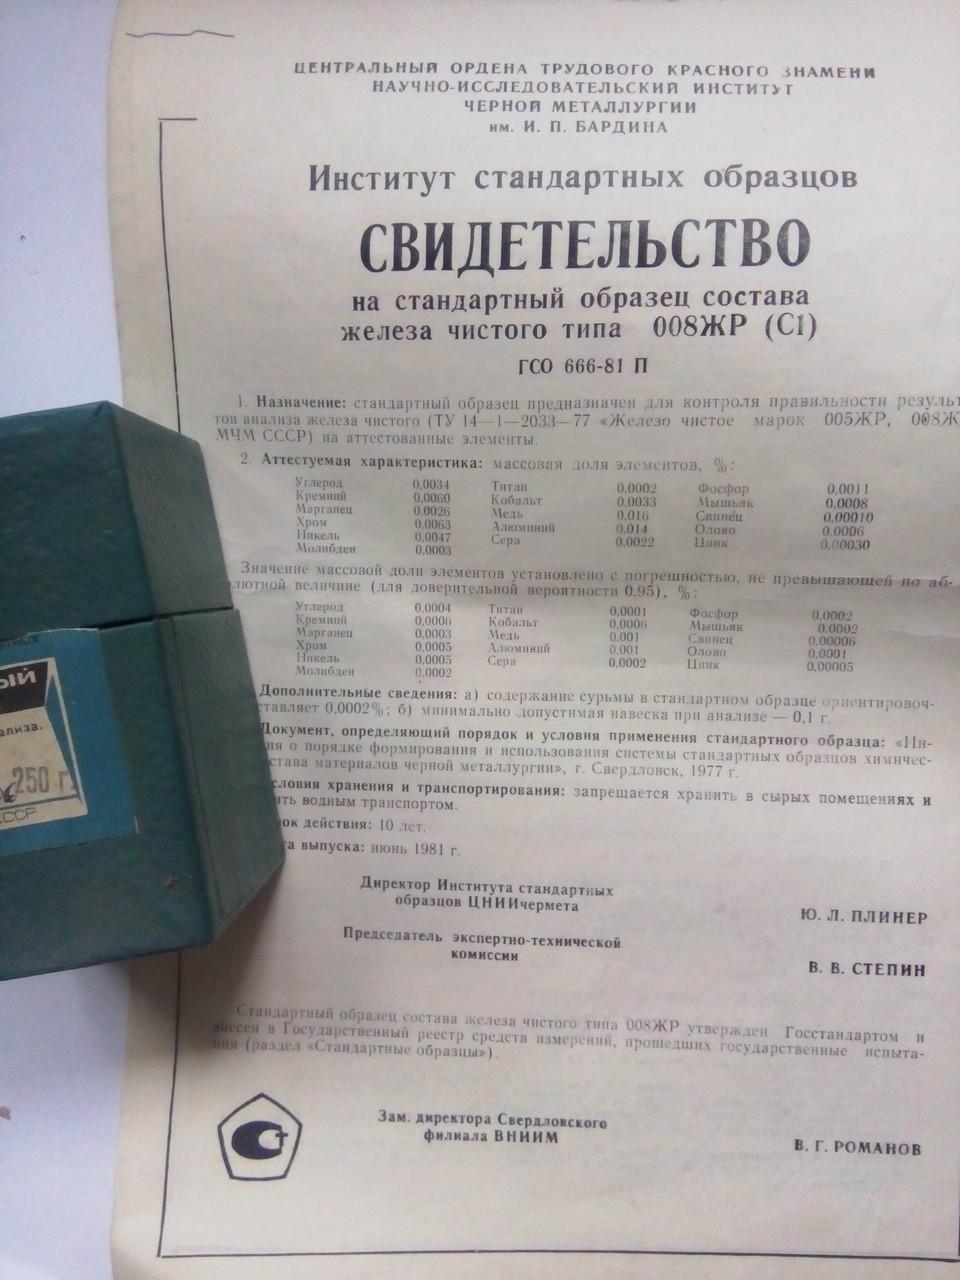 Образец,(С1) железо чистого типа  008ЖР